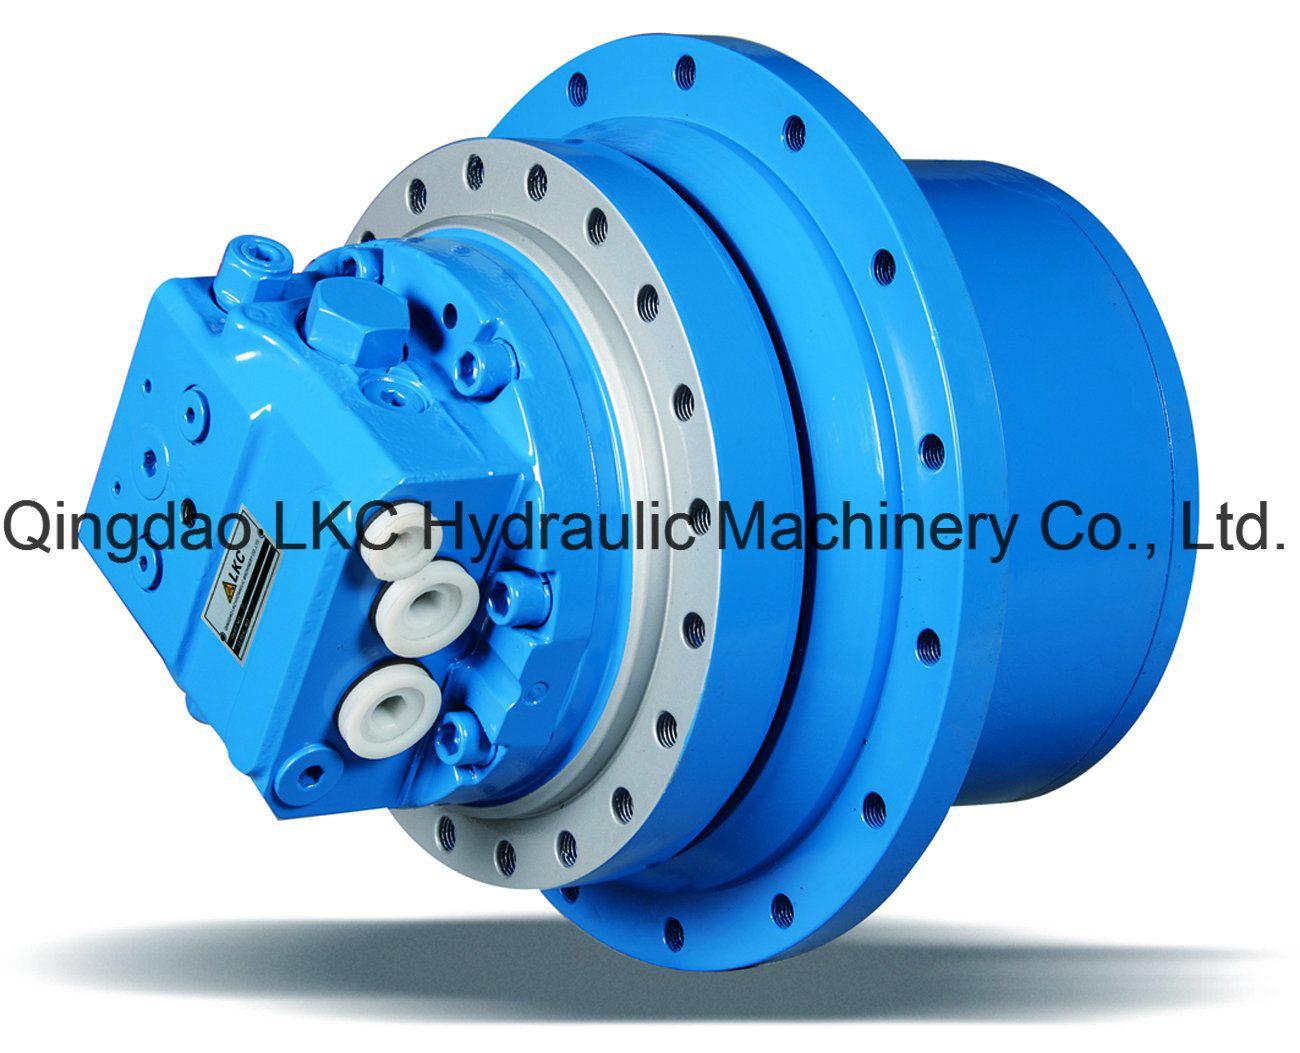 Hydraulic Piston Motor Assy for Doosan, Kobelco 6t~8t Excavator